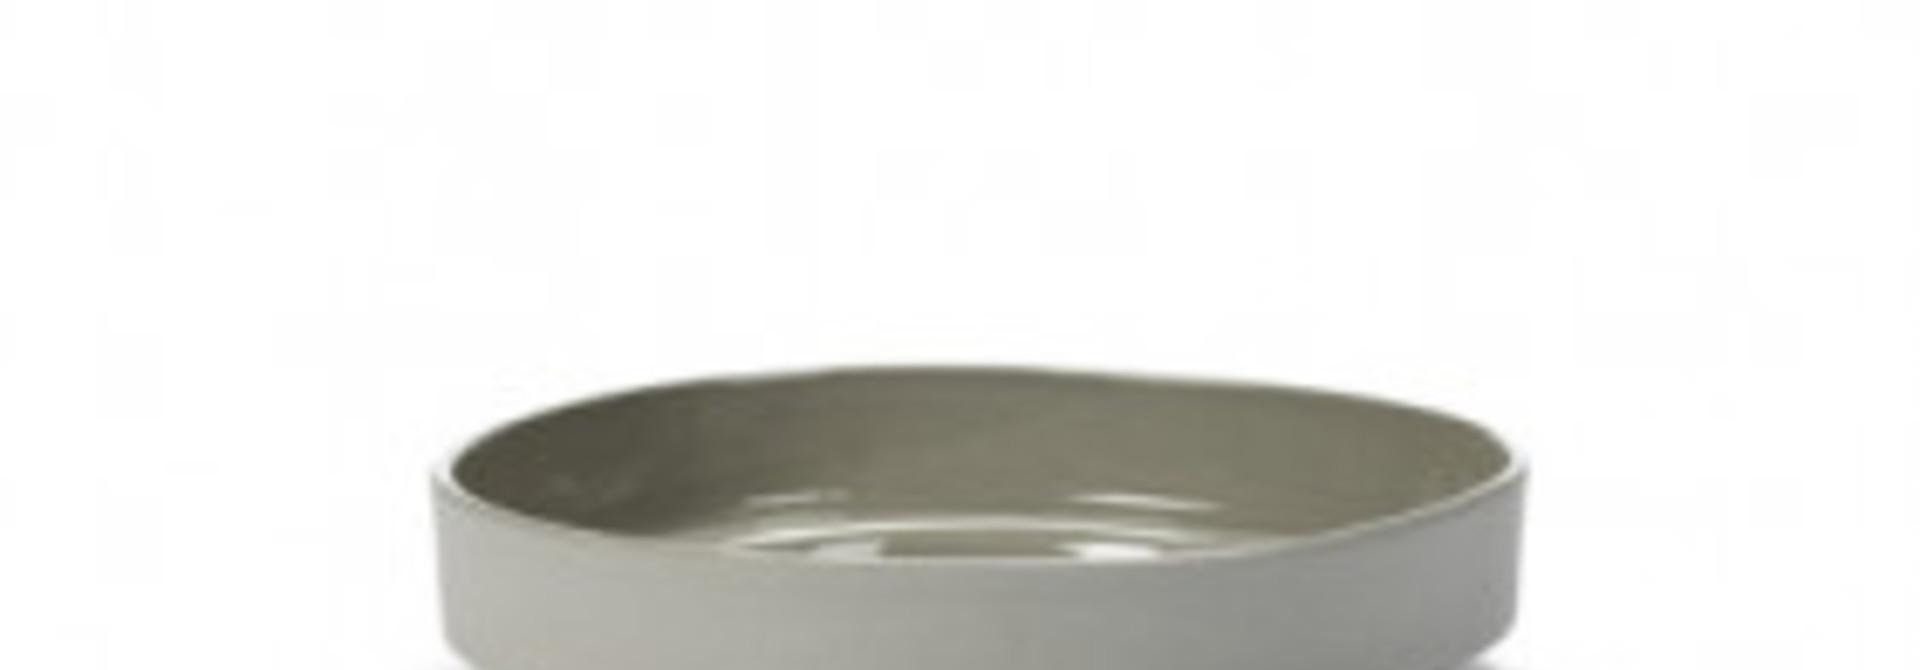 Salad/Pasta Bowl - M. Baas - Lt. Grey